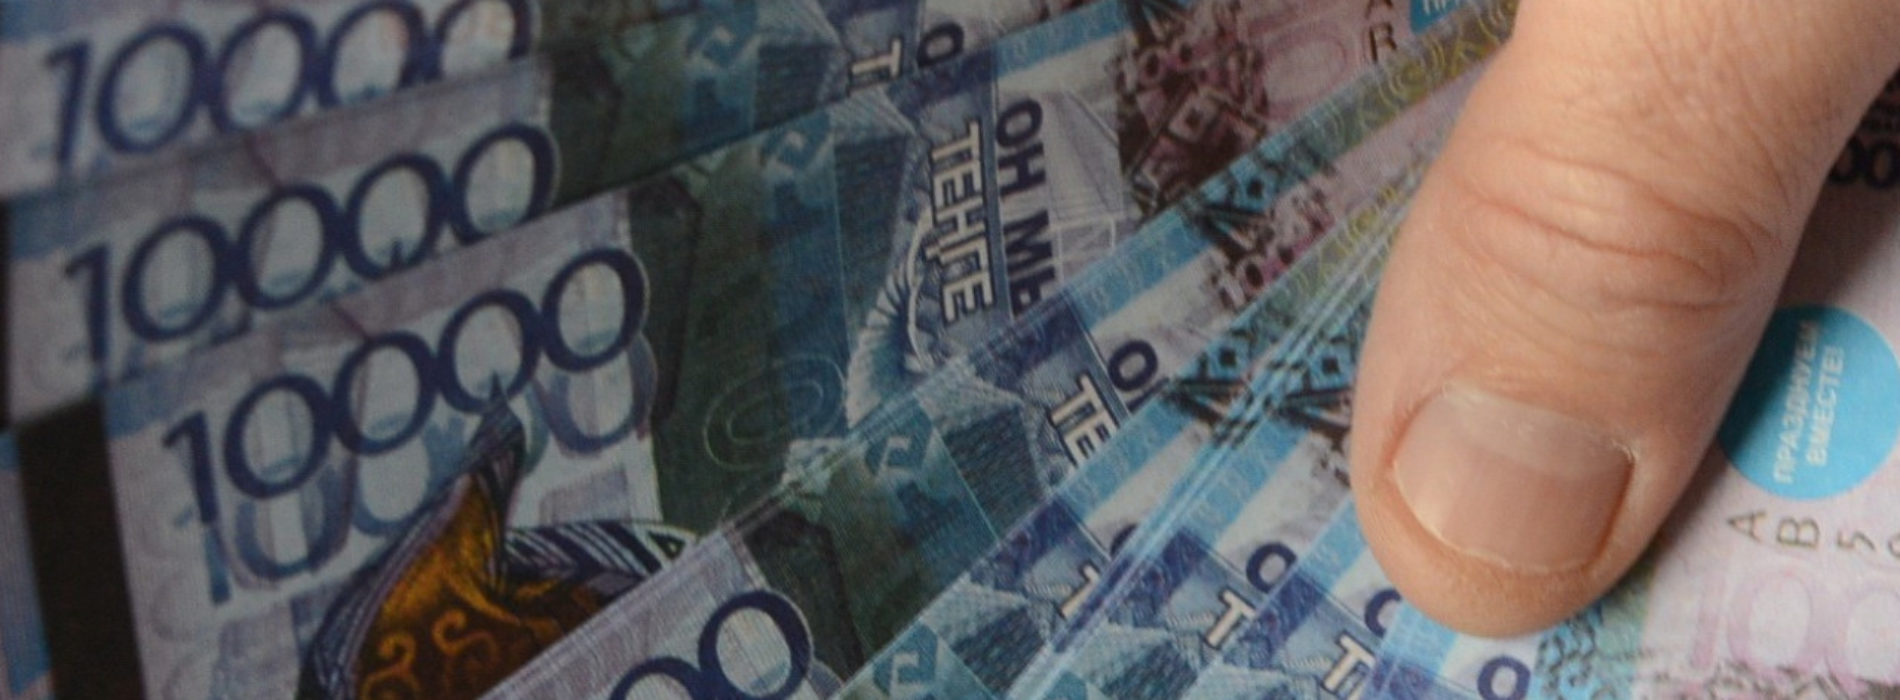 Начальник Шалкарской дистанции пути обещал трудоустройство за 1,2 млн тенге